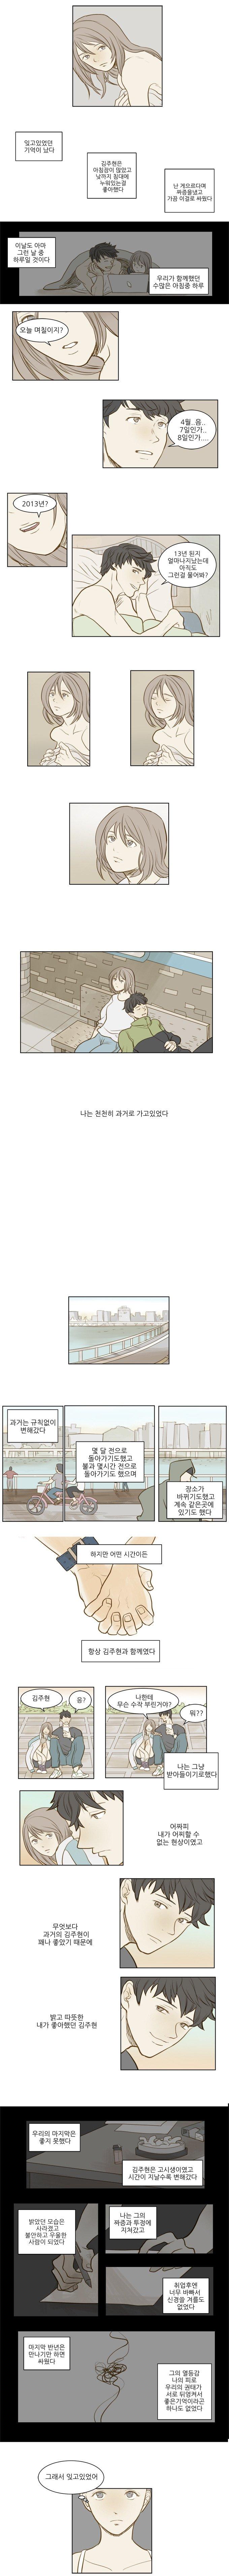 5.jpg 시간은 거꾸로 흐른다.manga [BGM] 시간은 거꾸로 간다.manhwa